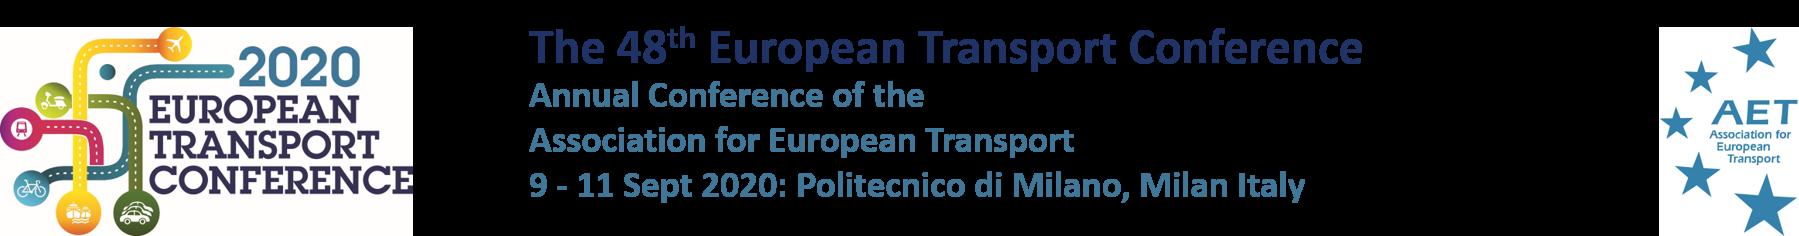 ETC Banner